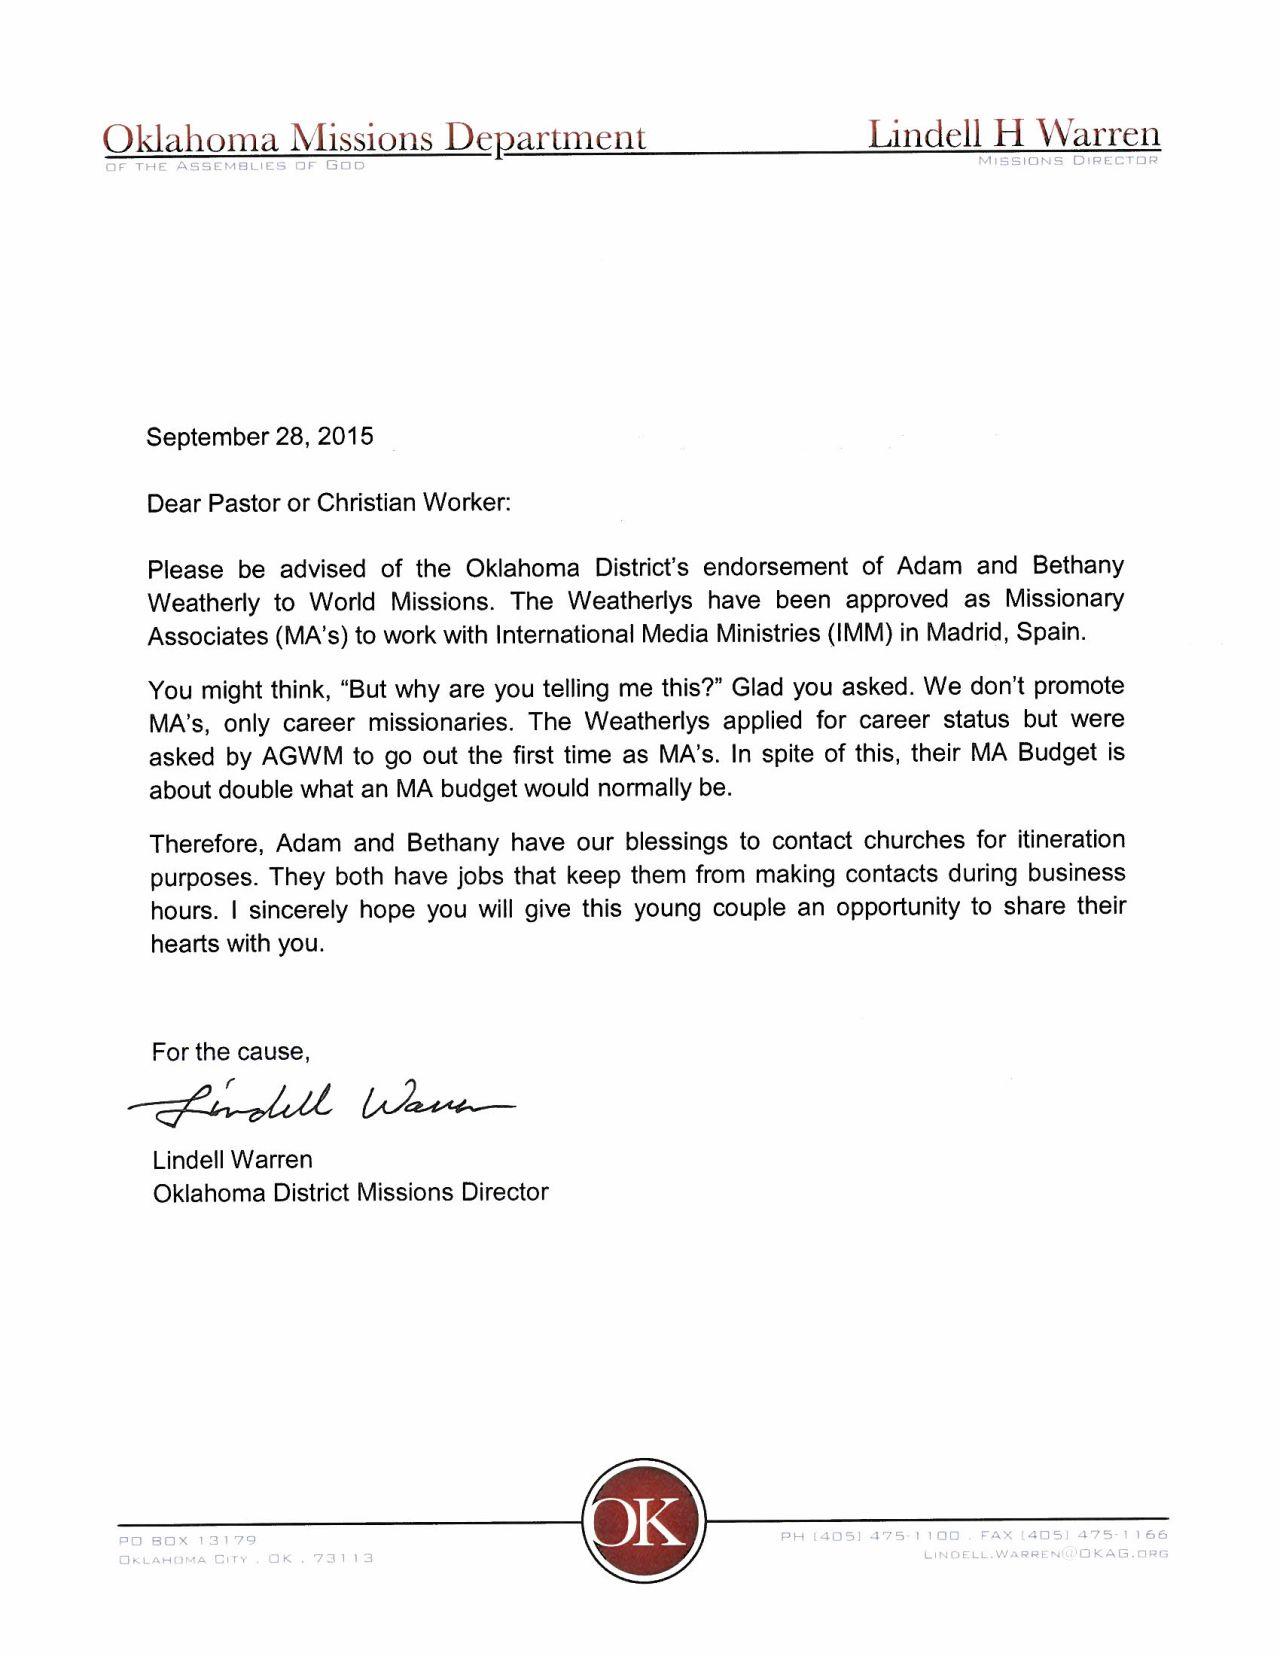 Letter from Lindell Warren